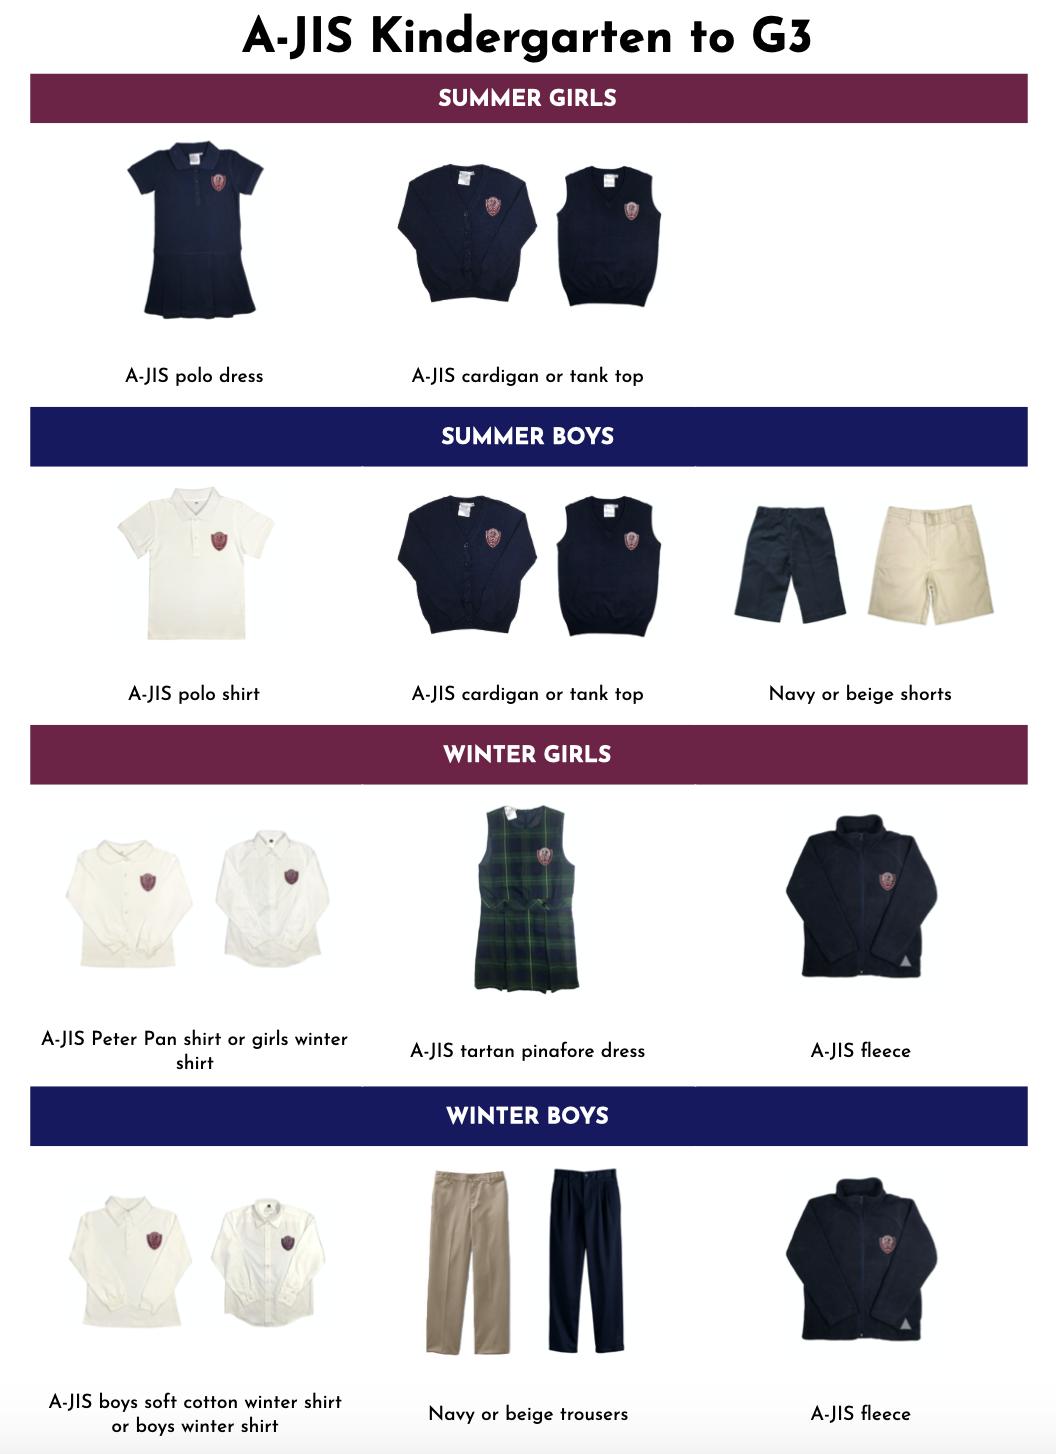 a-jis-uniform-guide-new-1.png